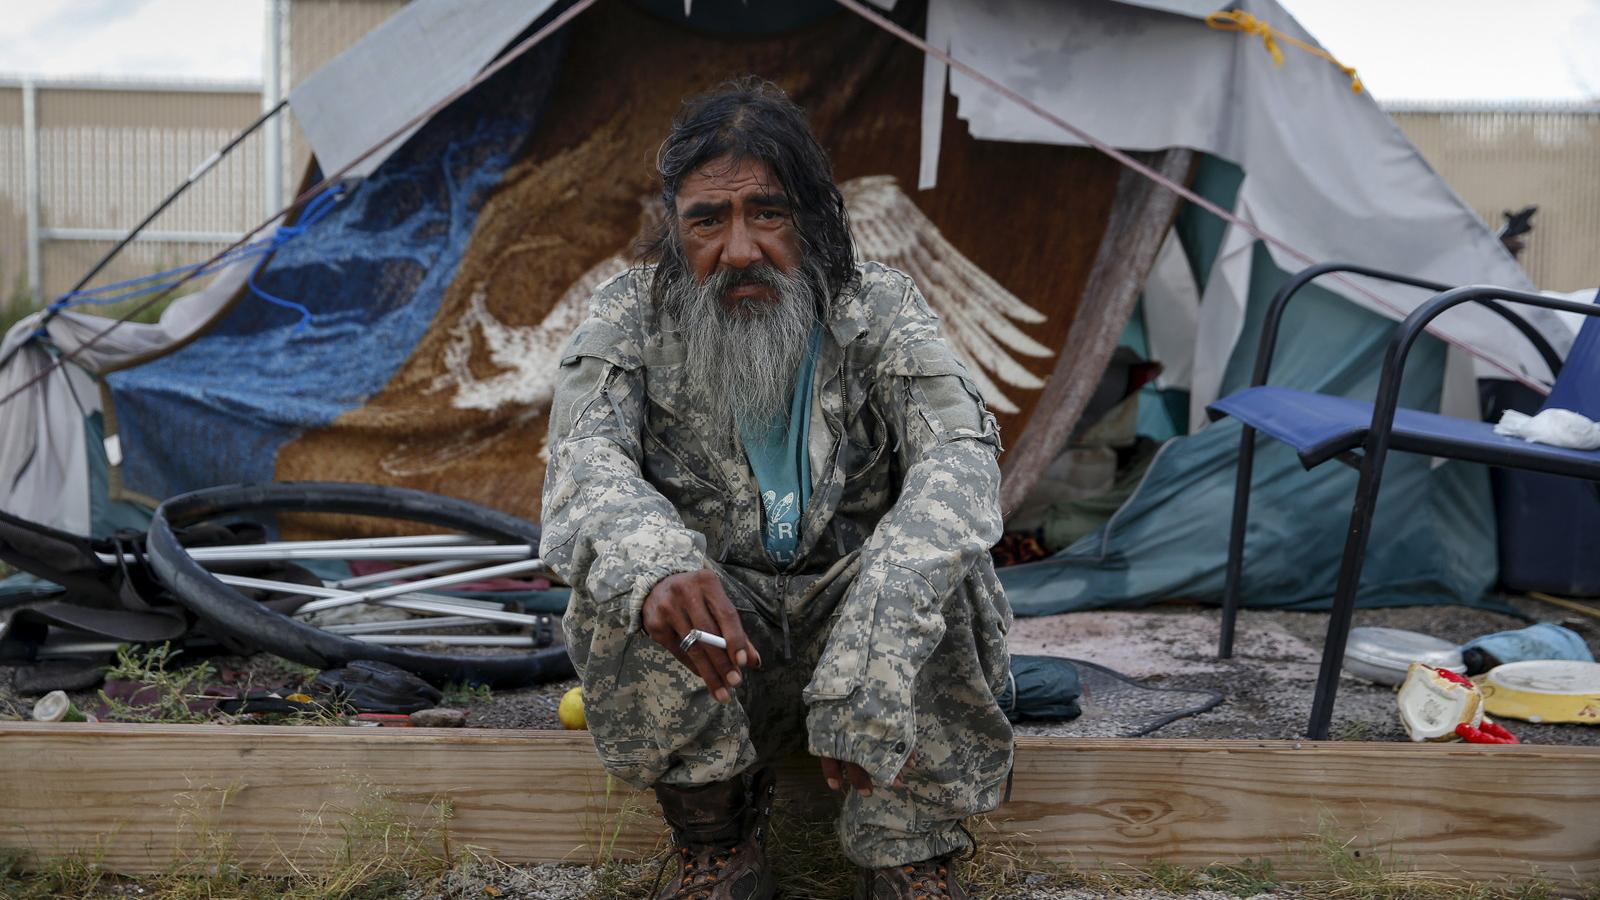 A bearded veteran sits outside a tent smoking a cigarette.